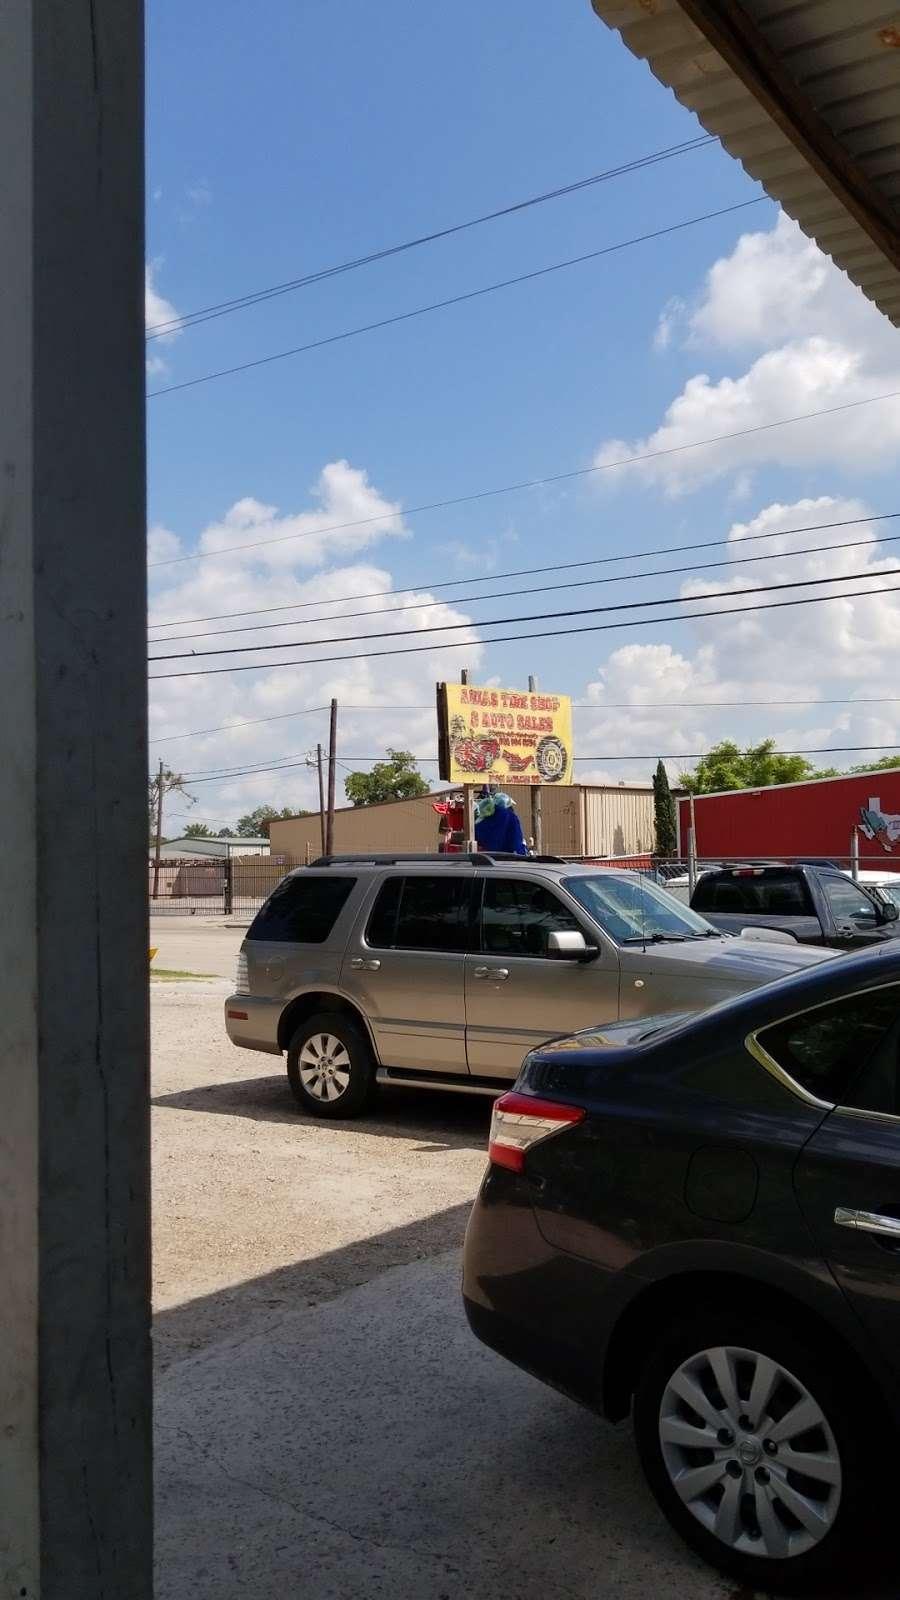 Arias Tire Shop & Auto Sales - car repair  | Photo 3 of 6 | Address: 10601 Airline Dr, Houston, TX 77037, USA | Phone: (832) 564-5554